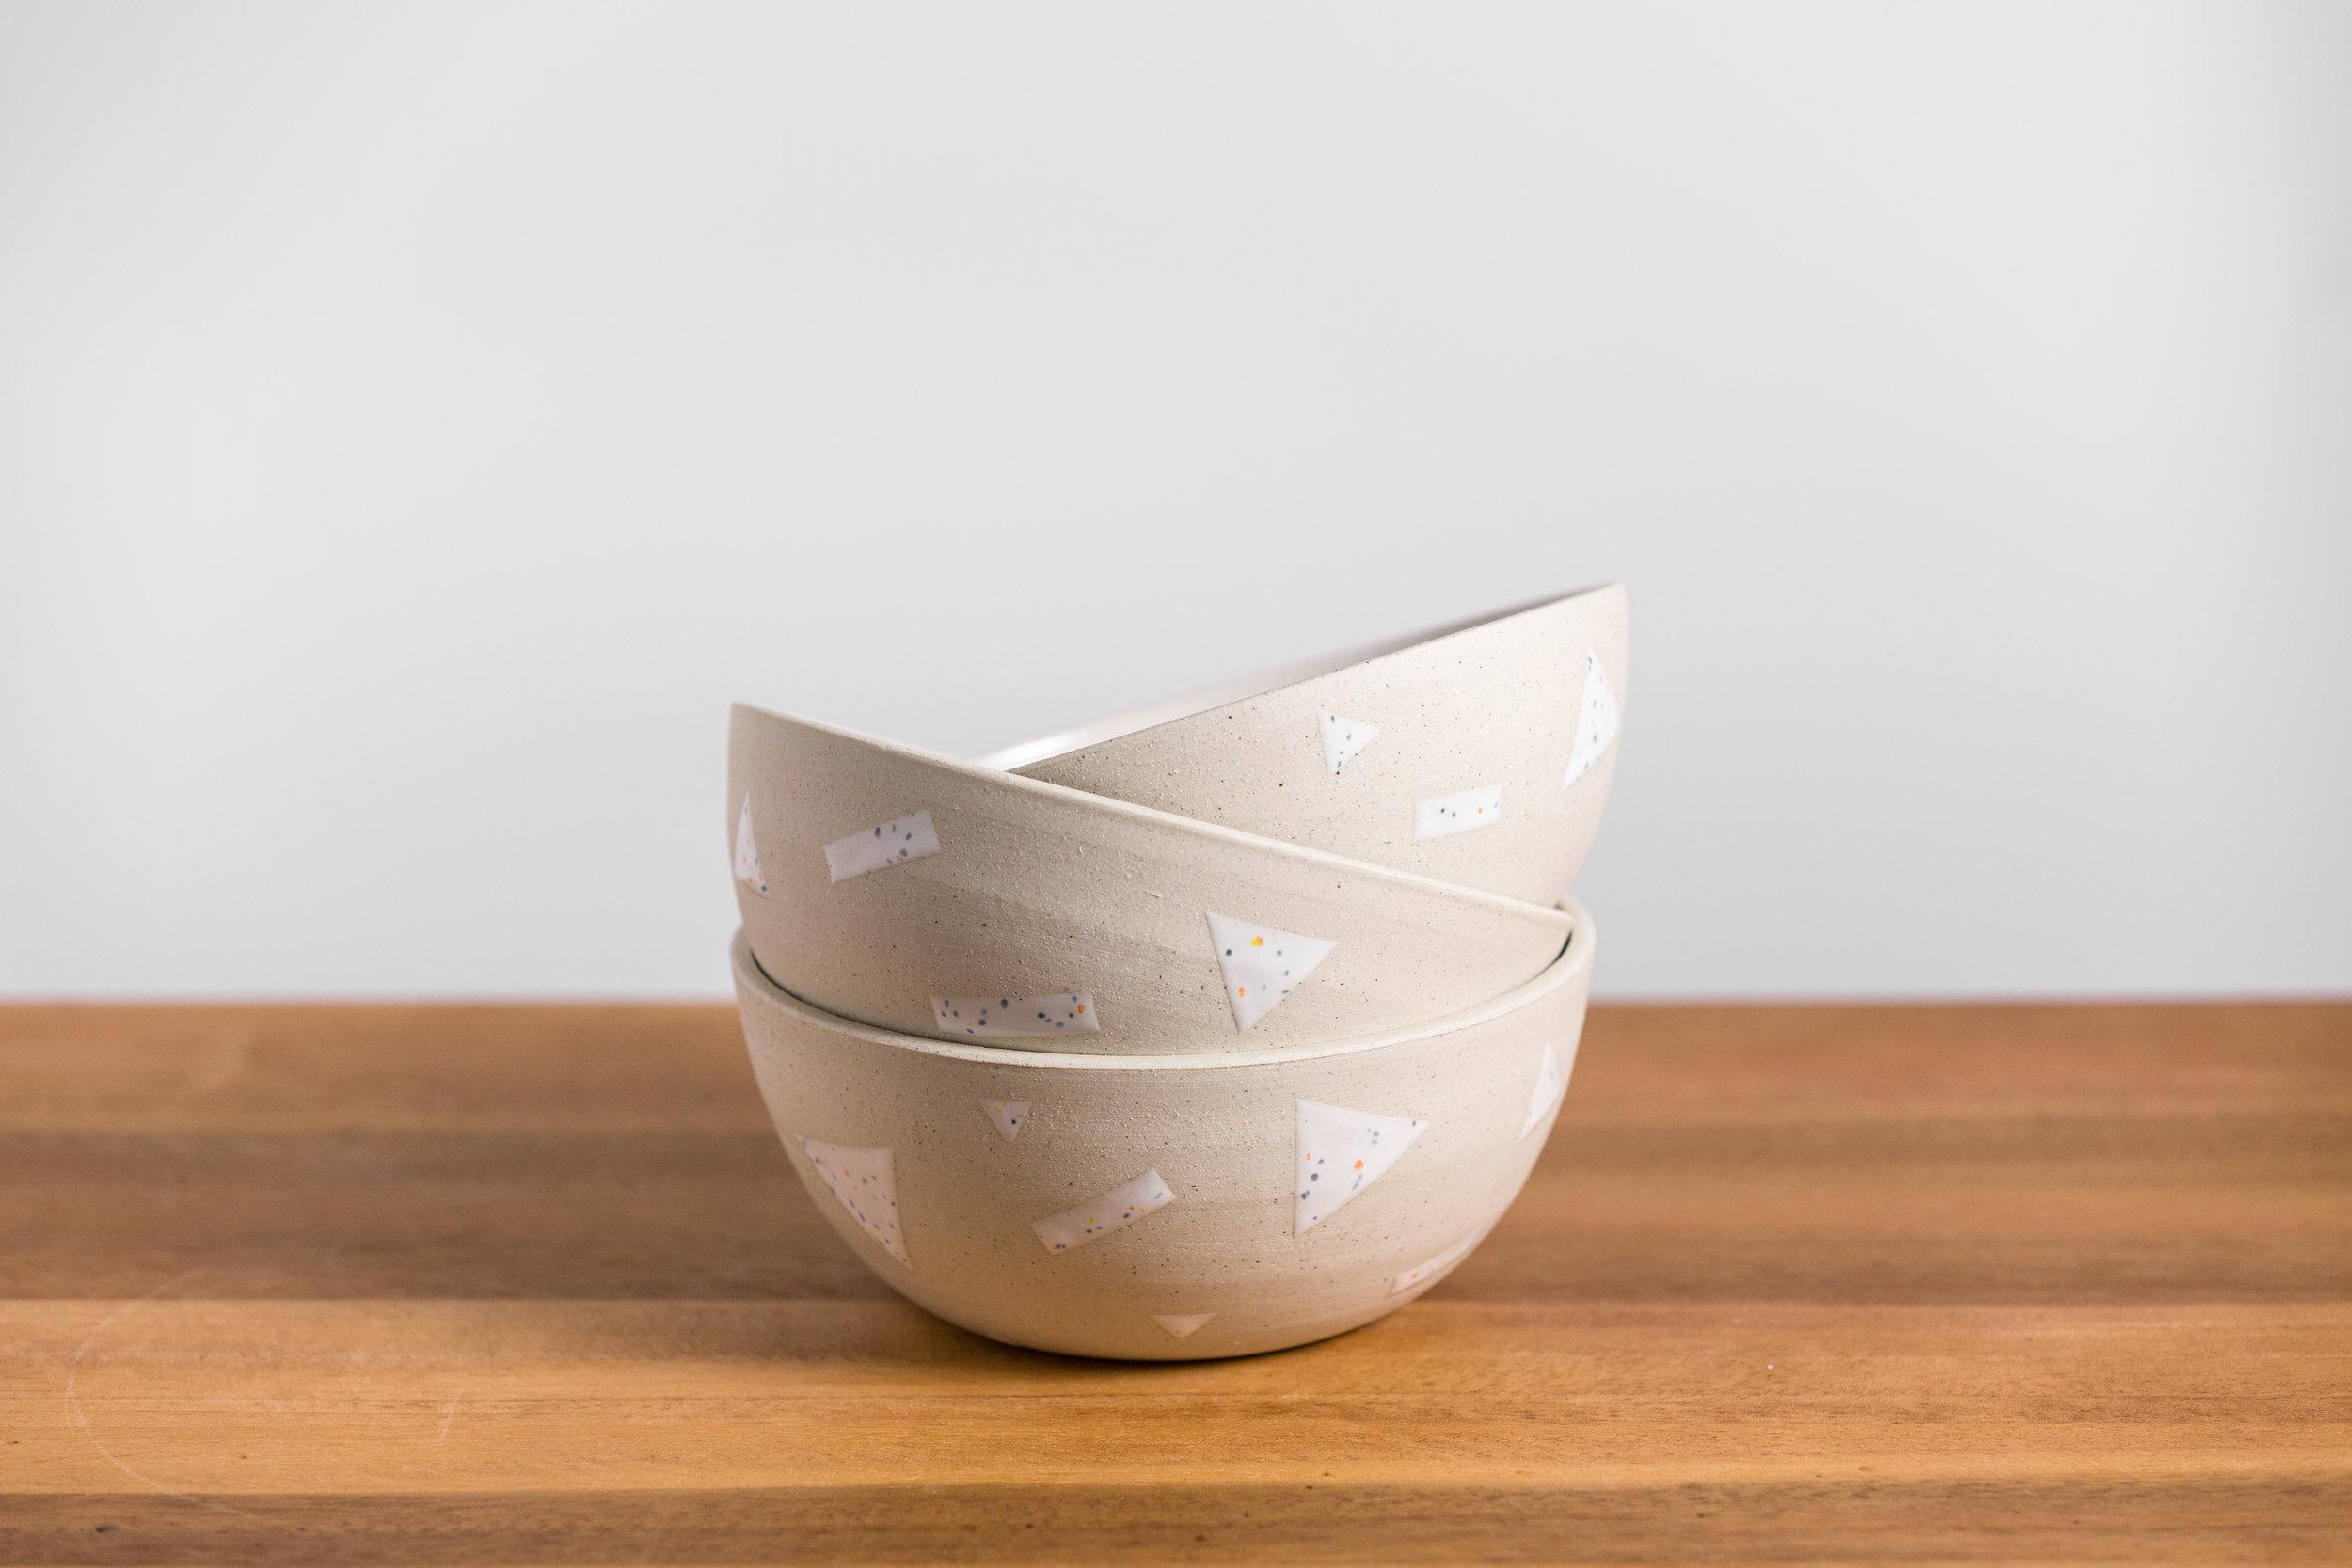 Cutout Bowls - Retail $42